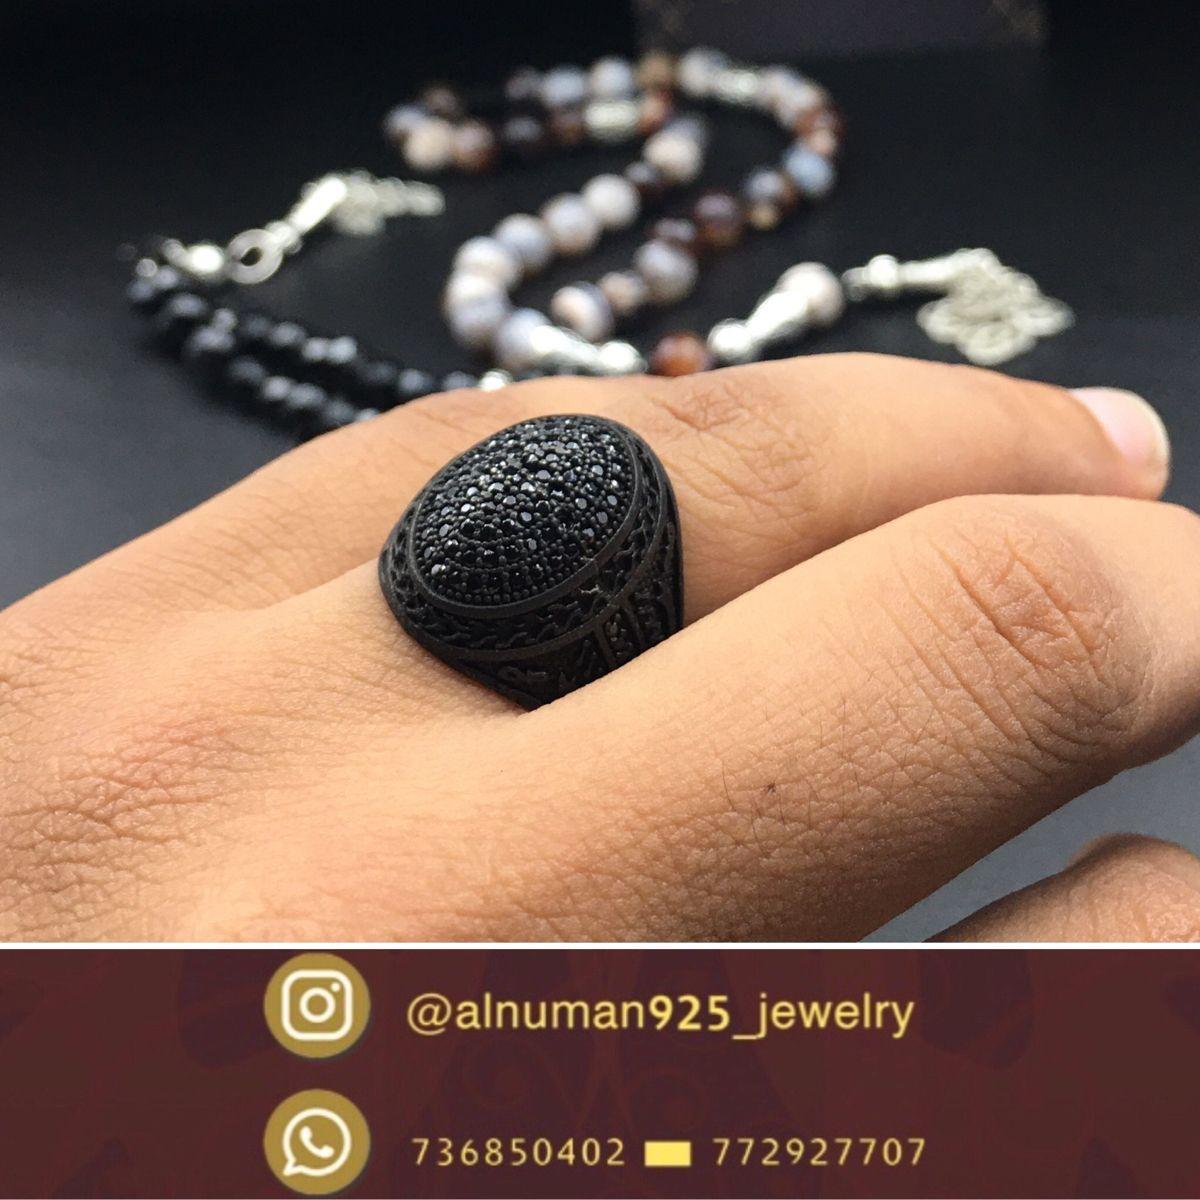 خاتم رجالي فضة جديد خواتم هداياء هدية صنعاء Jewelry Best Friend Pictures Rings